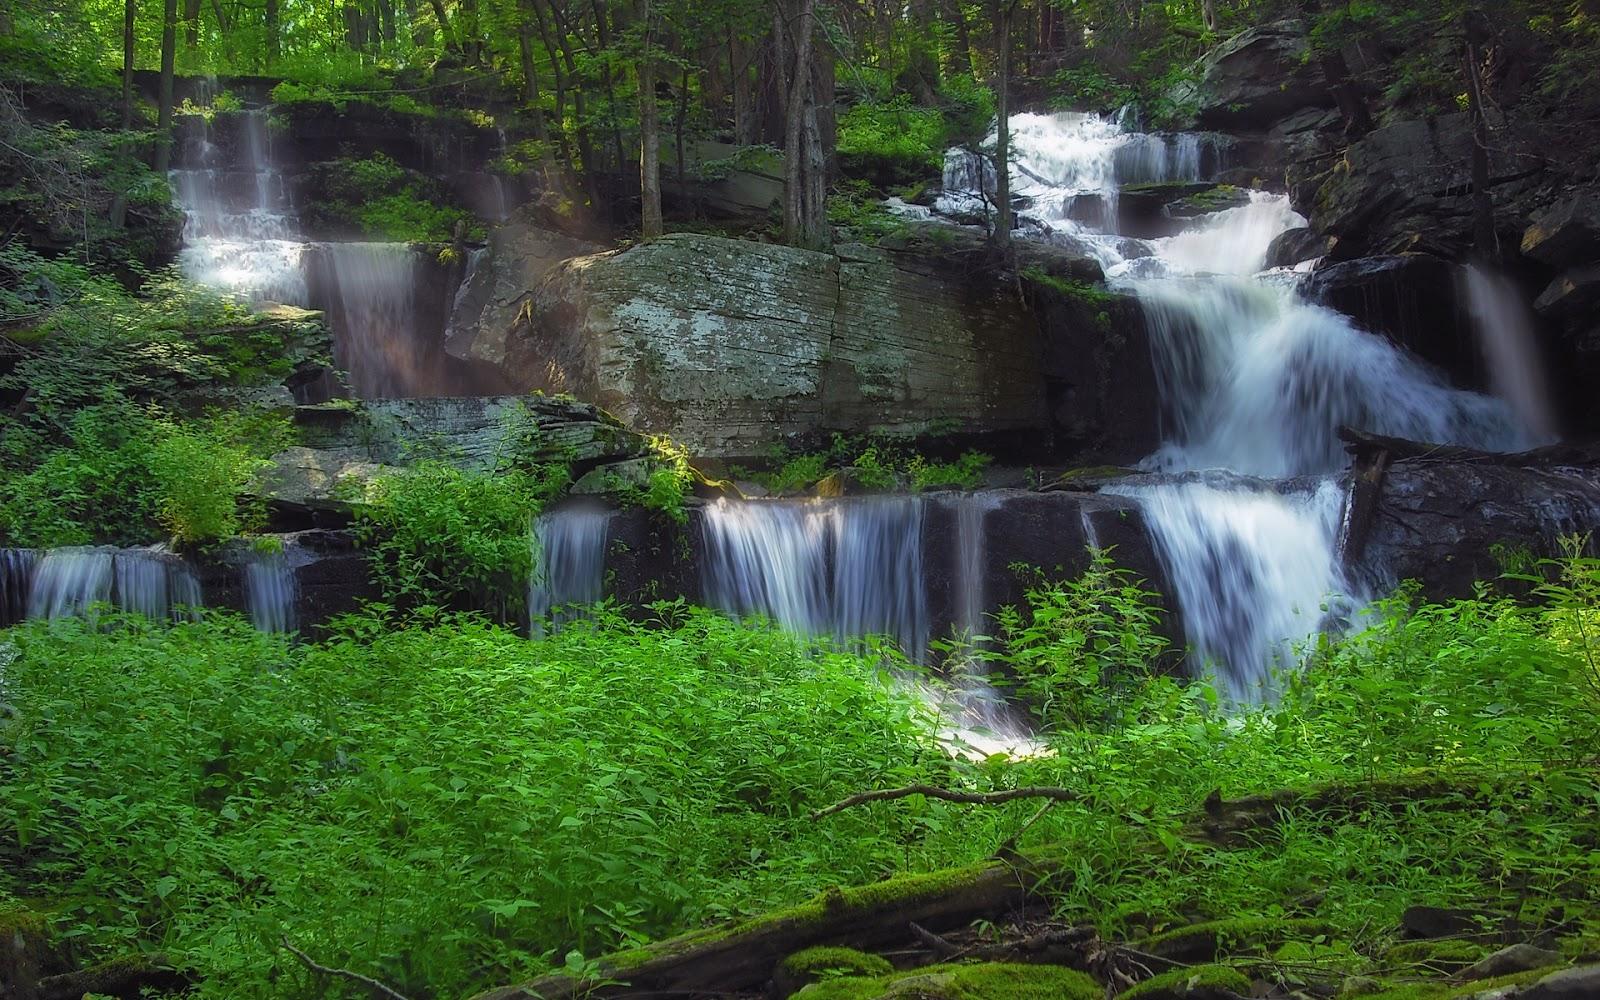 https://3.bp.blogspot.com/_Gq1jO6iuU2U/TSkWuncB6dI/AAAAAAAAHW8/aVIiCpFo4rU/s1600/forest+waterfalls+hd+wallpaper.jpg